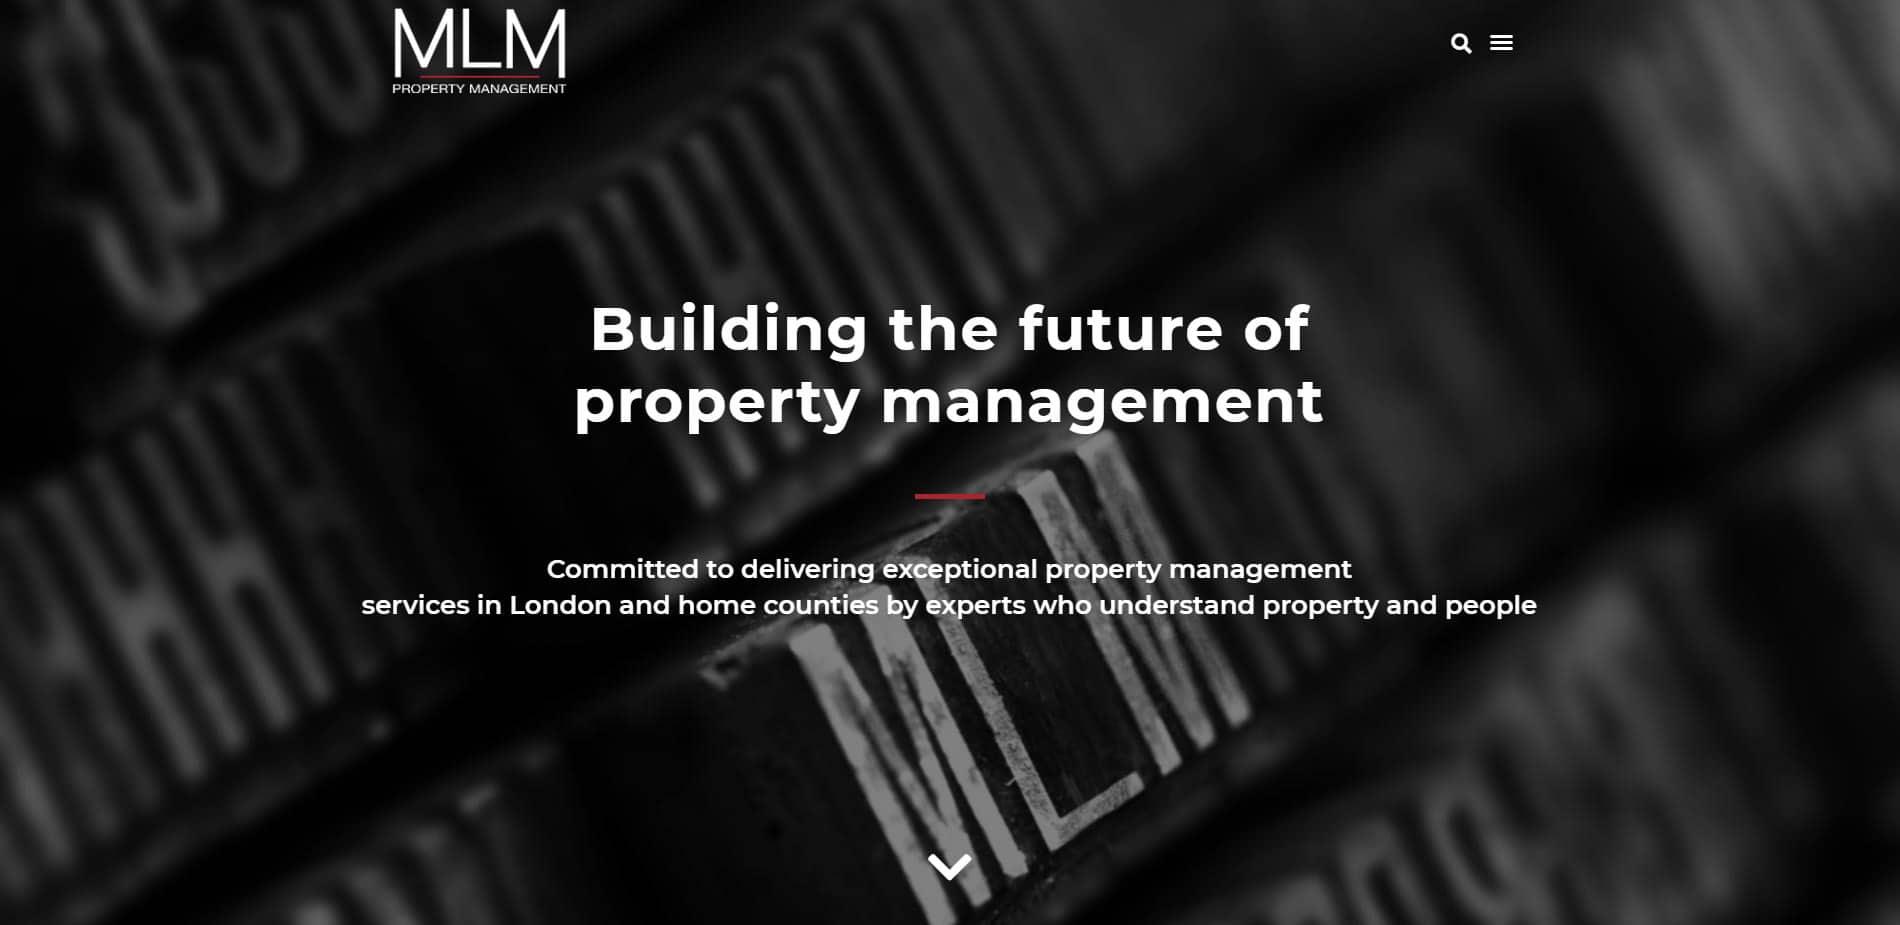 Mlm Property Management Image